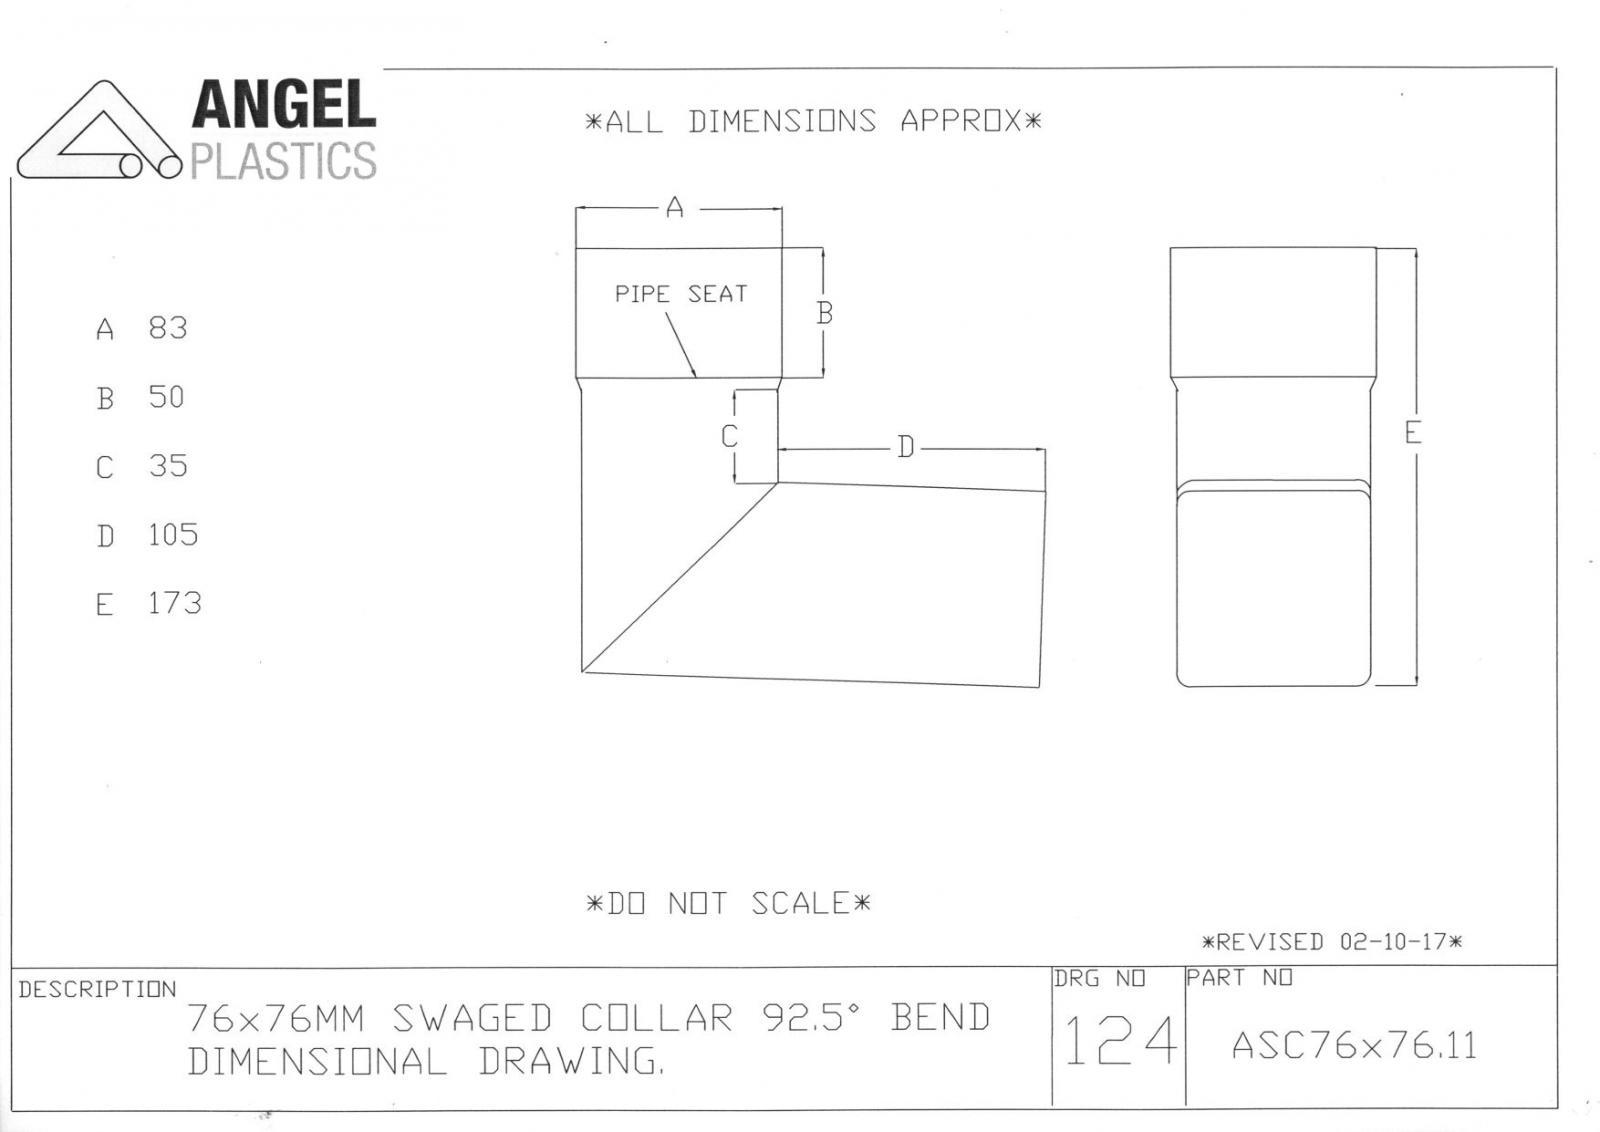 76mm Square Swaged Aluminium Downpipe